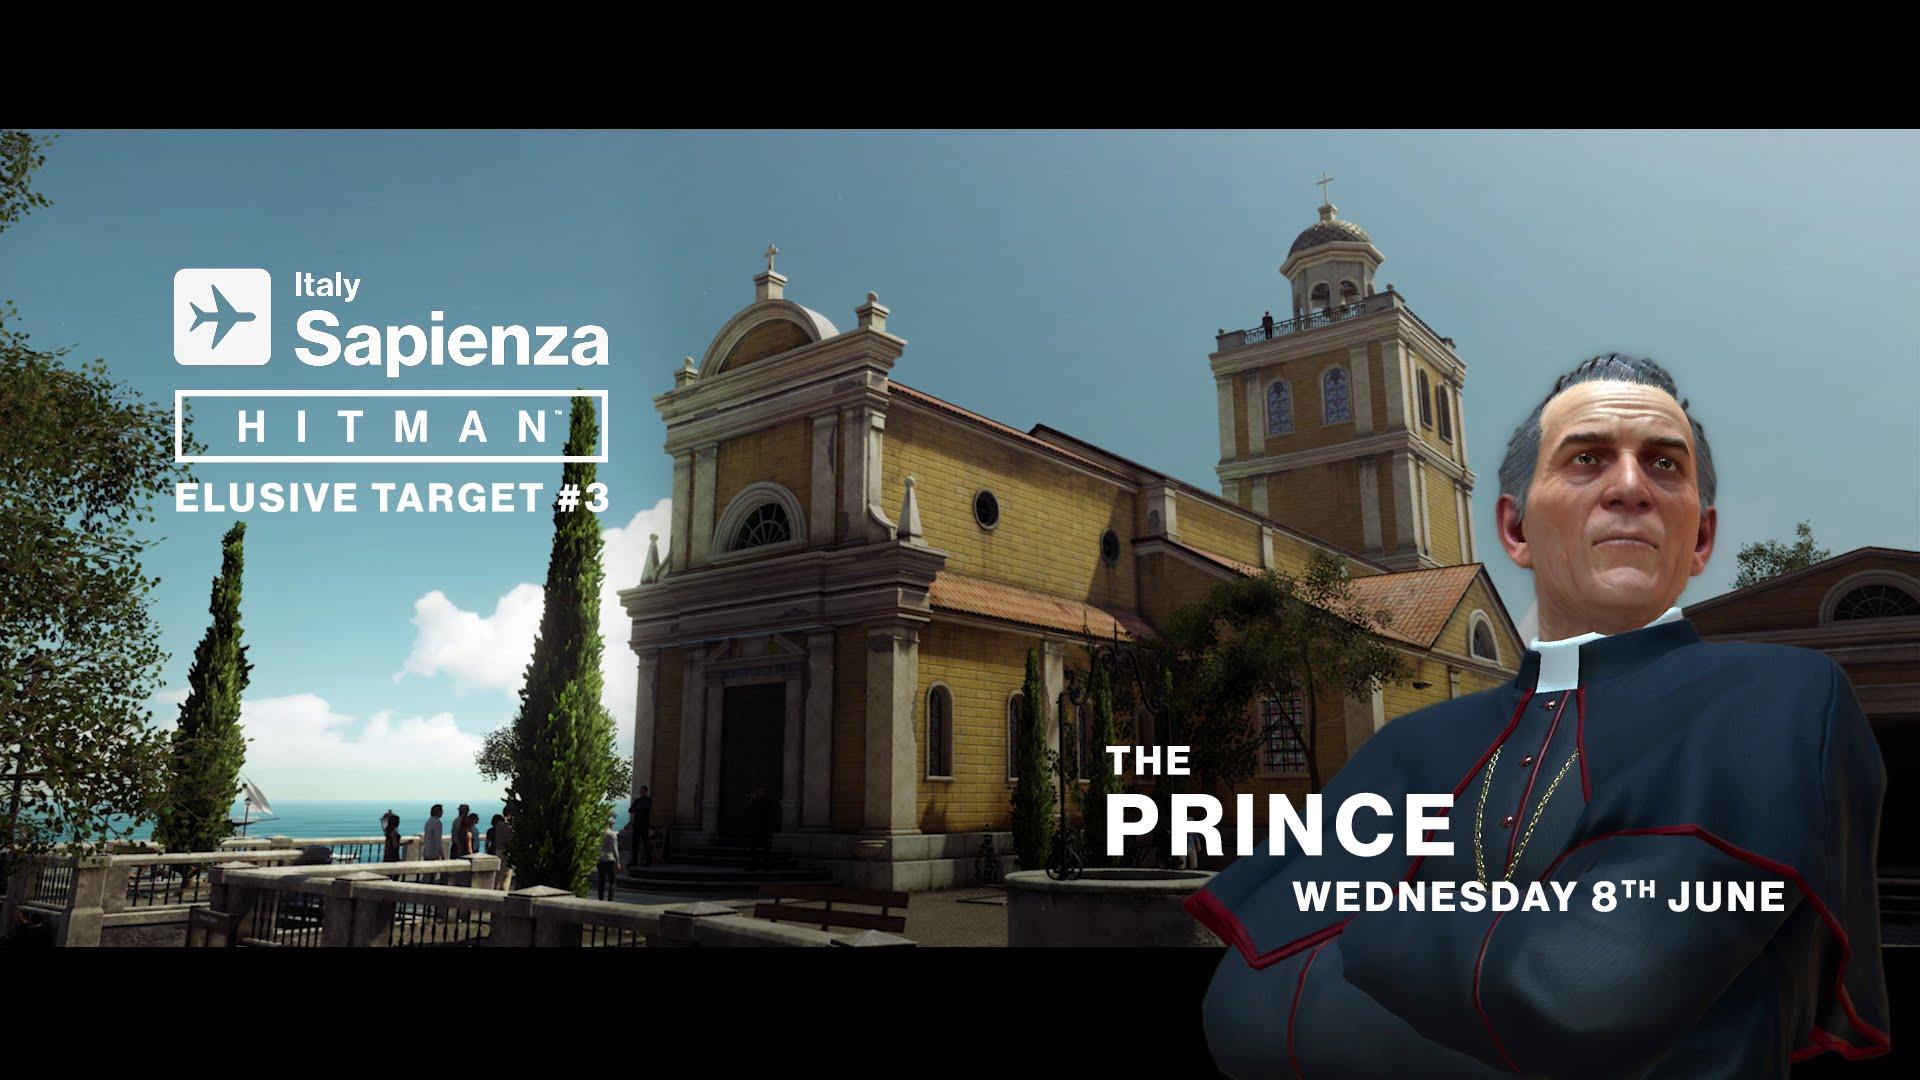 HITMAN - Elusive Target #3 - The Prince